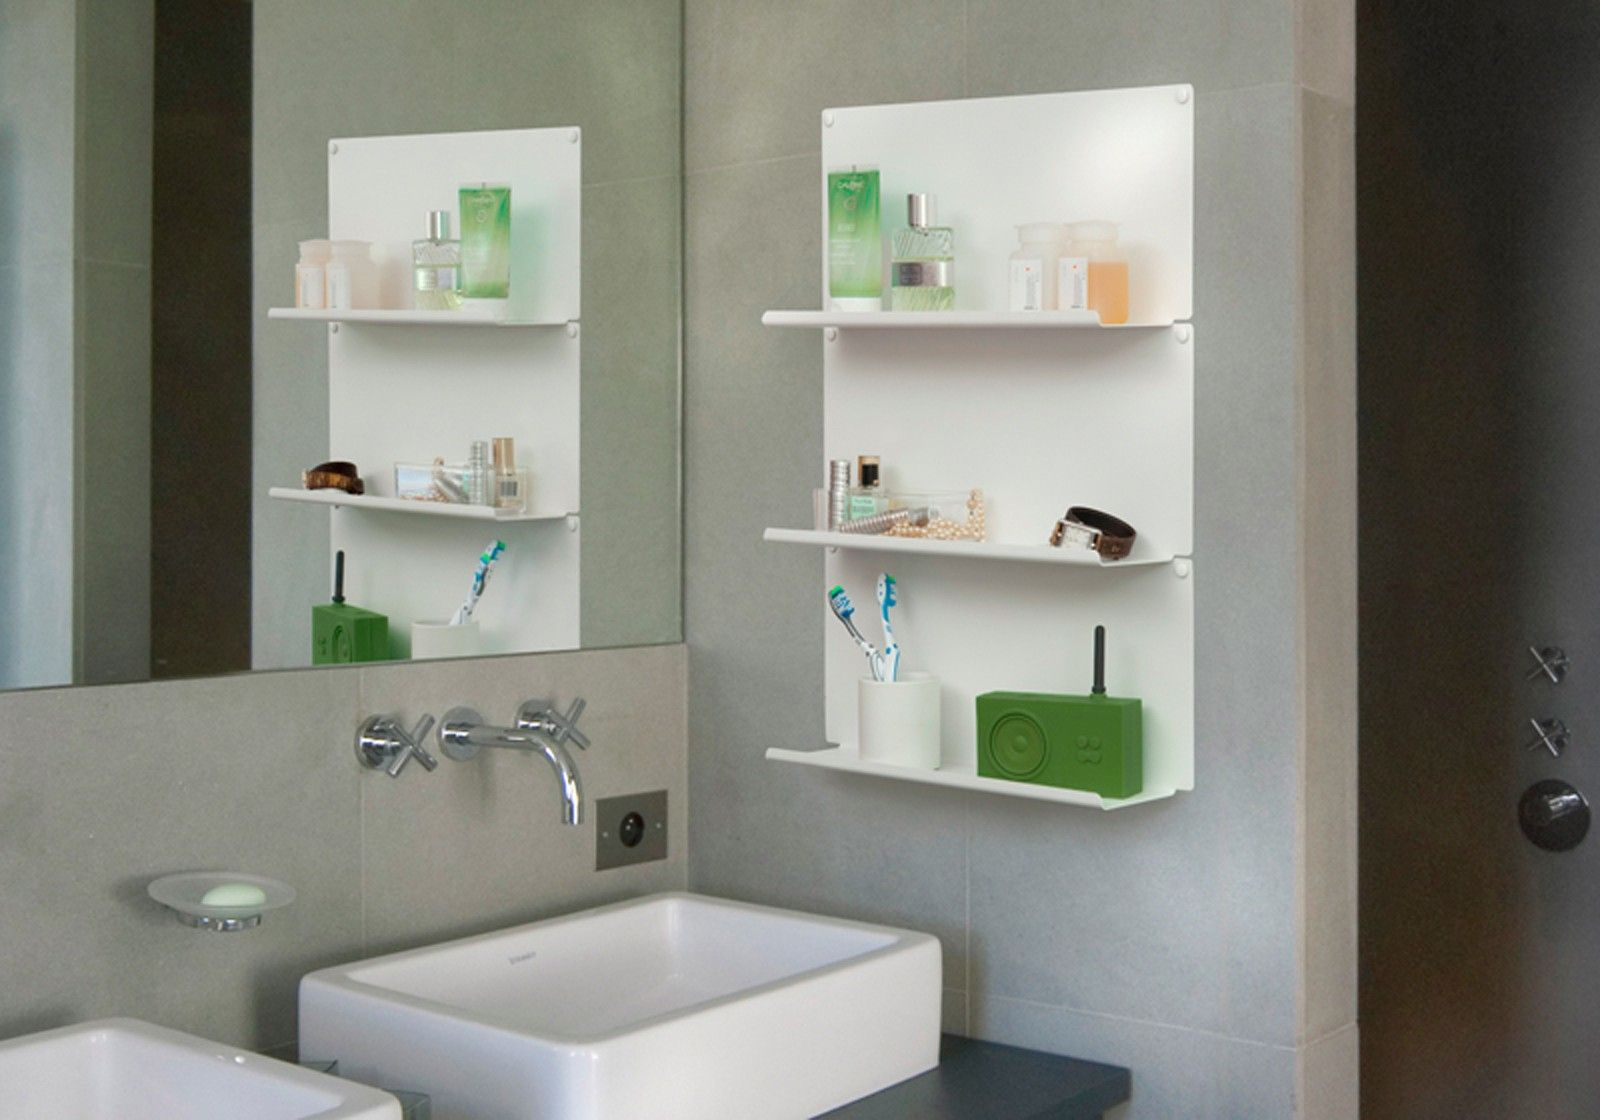 Etagere salle de bain canadian tire salle de bains - Etagere ikea salle de bain ...